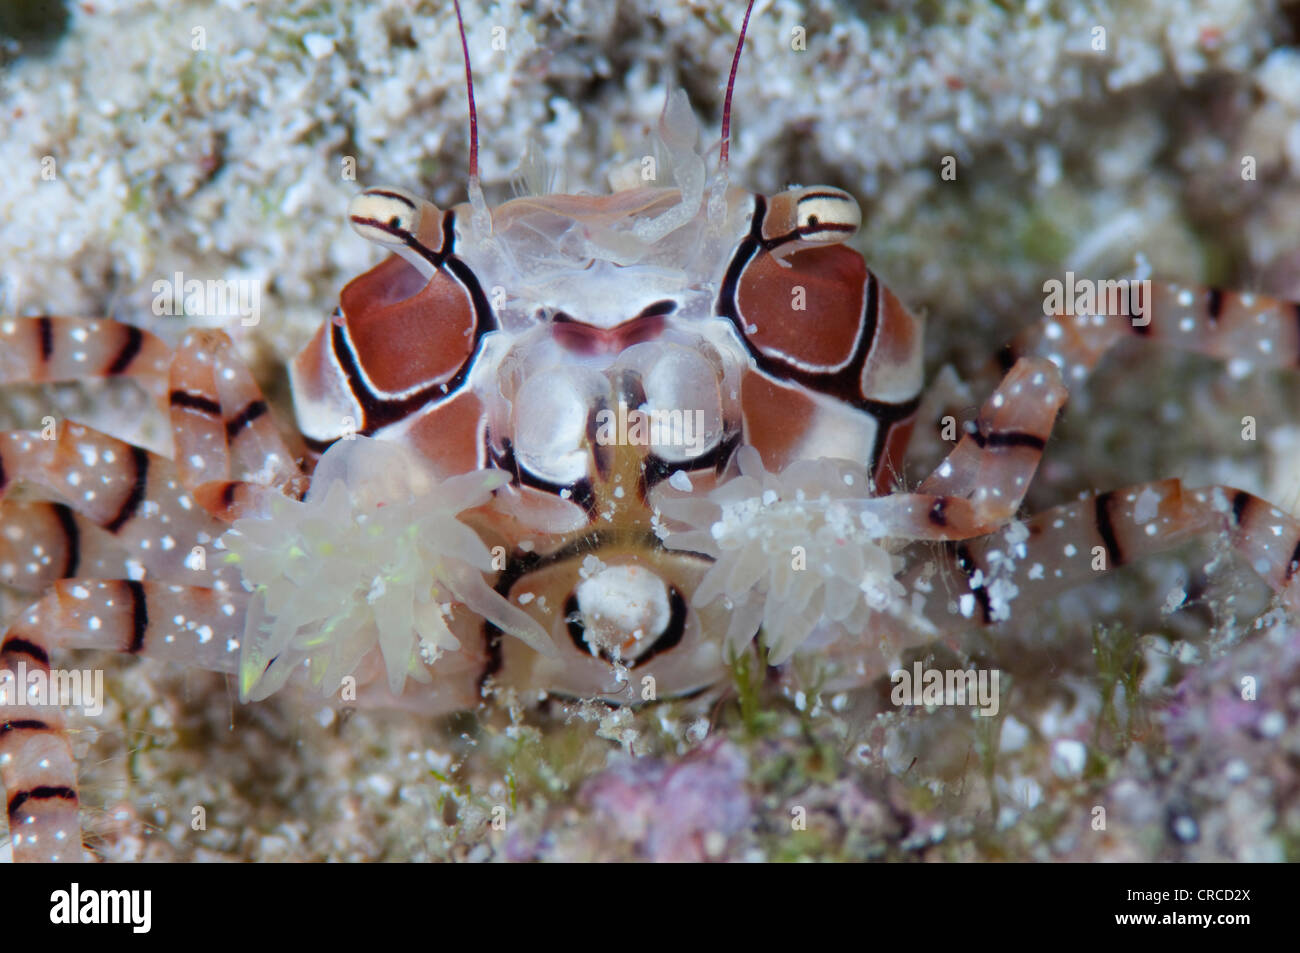 Boxer Crab Lybia tessellata, with protective anemones, Wakatobi, Sulawesi Tenggara, Indonesia. - Stock Image